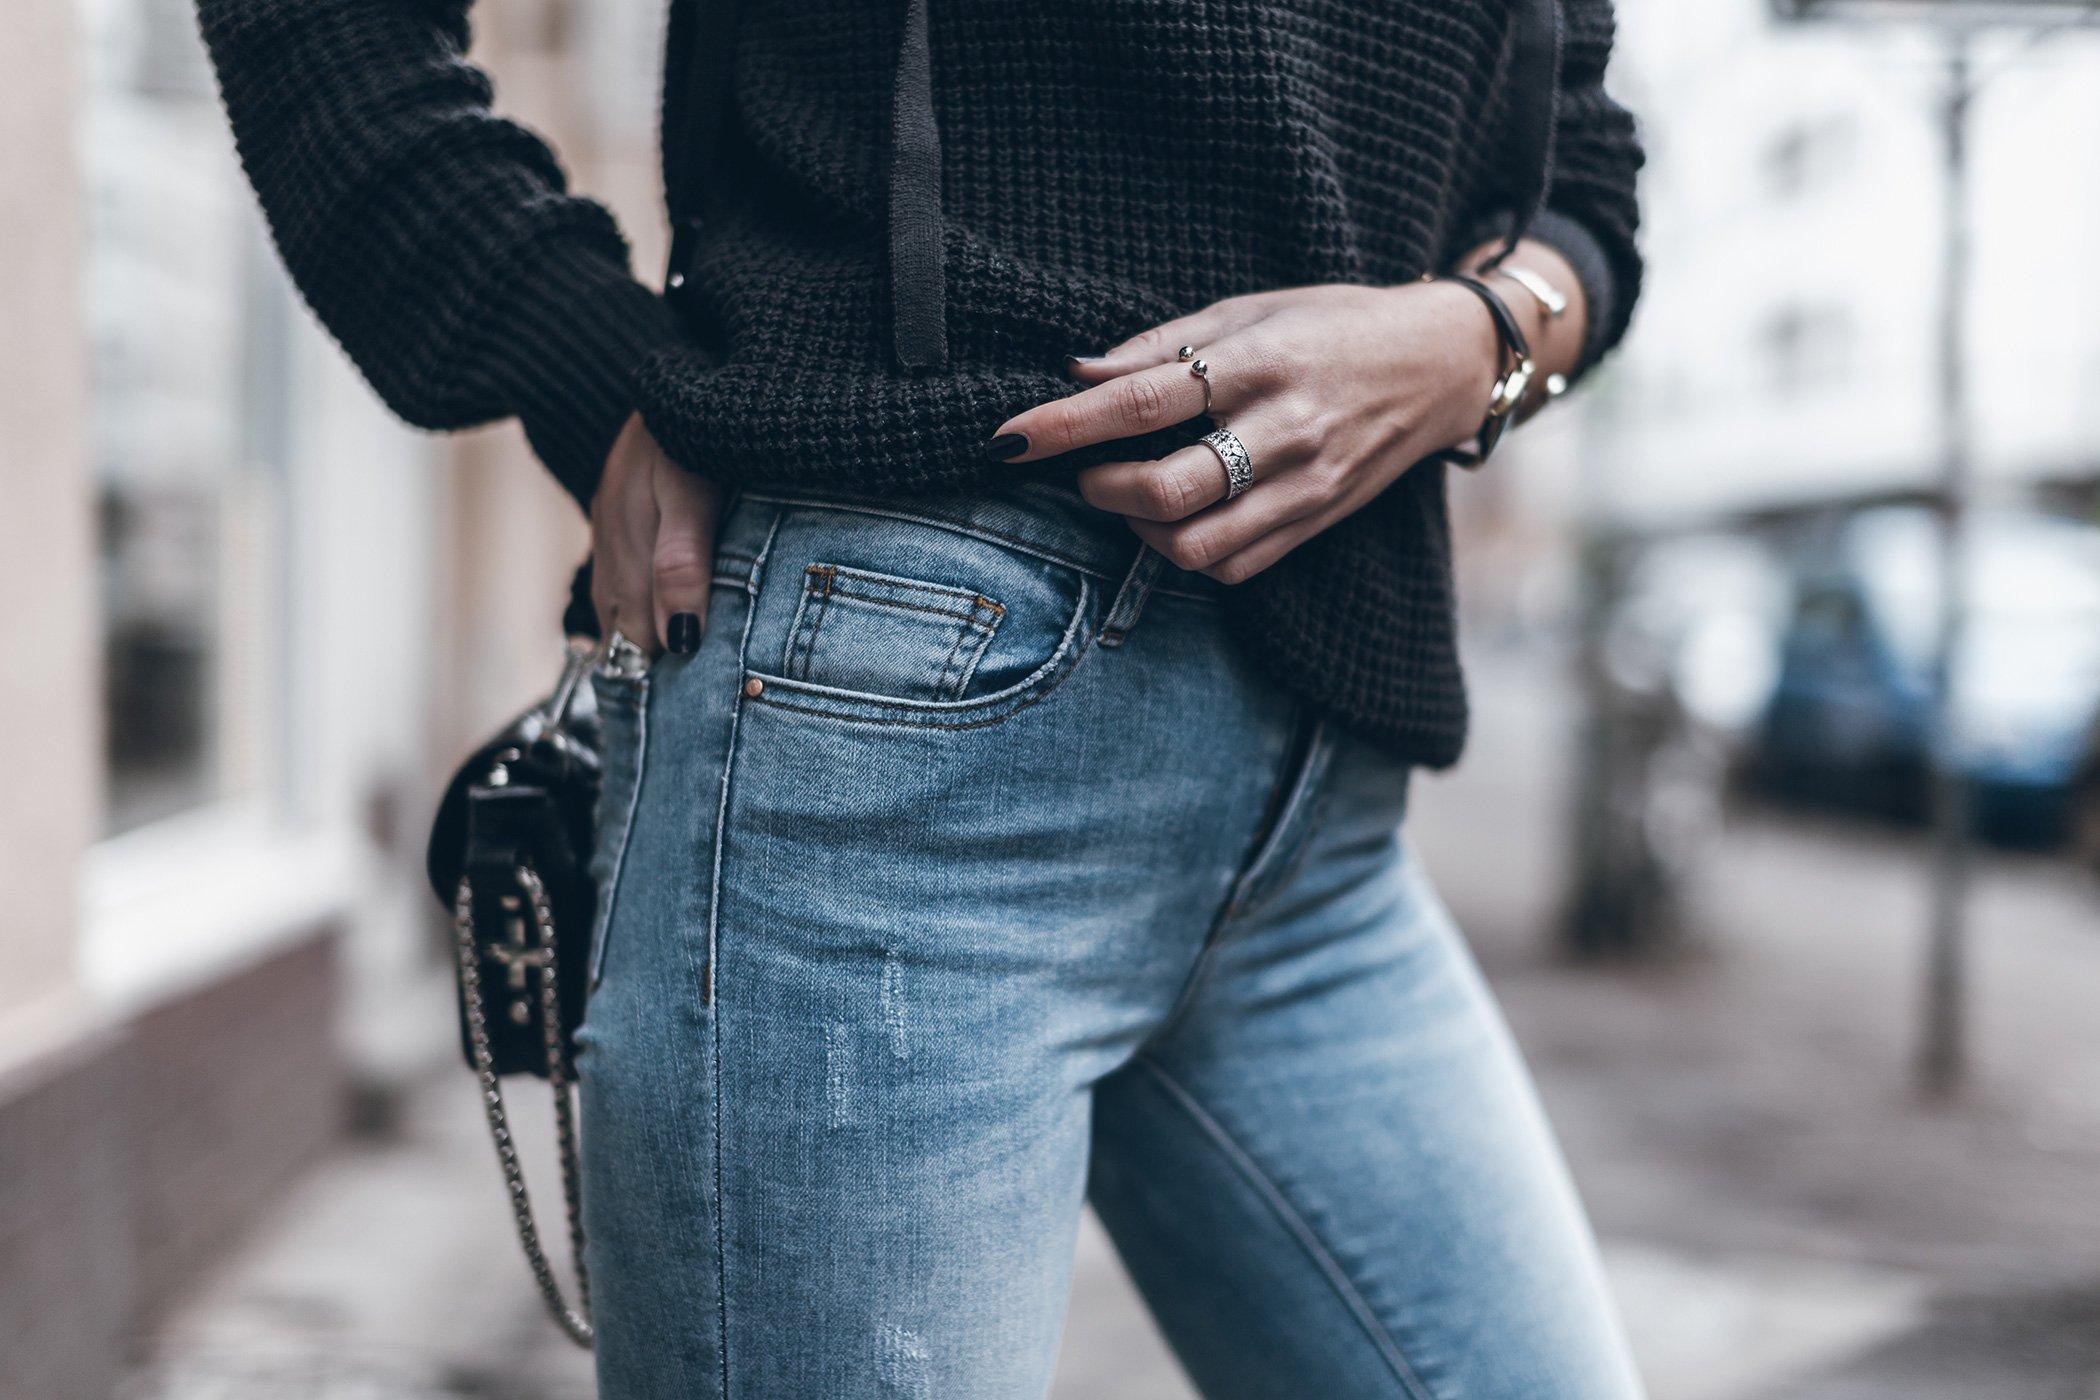 mikuta-vila-jeans-and-sweater-10